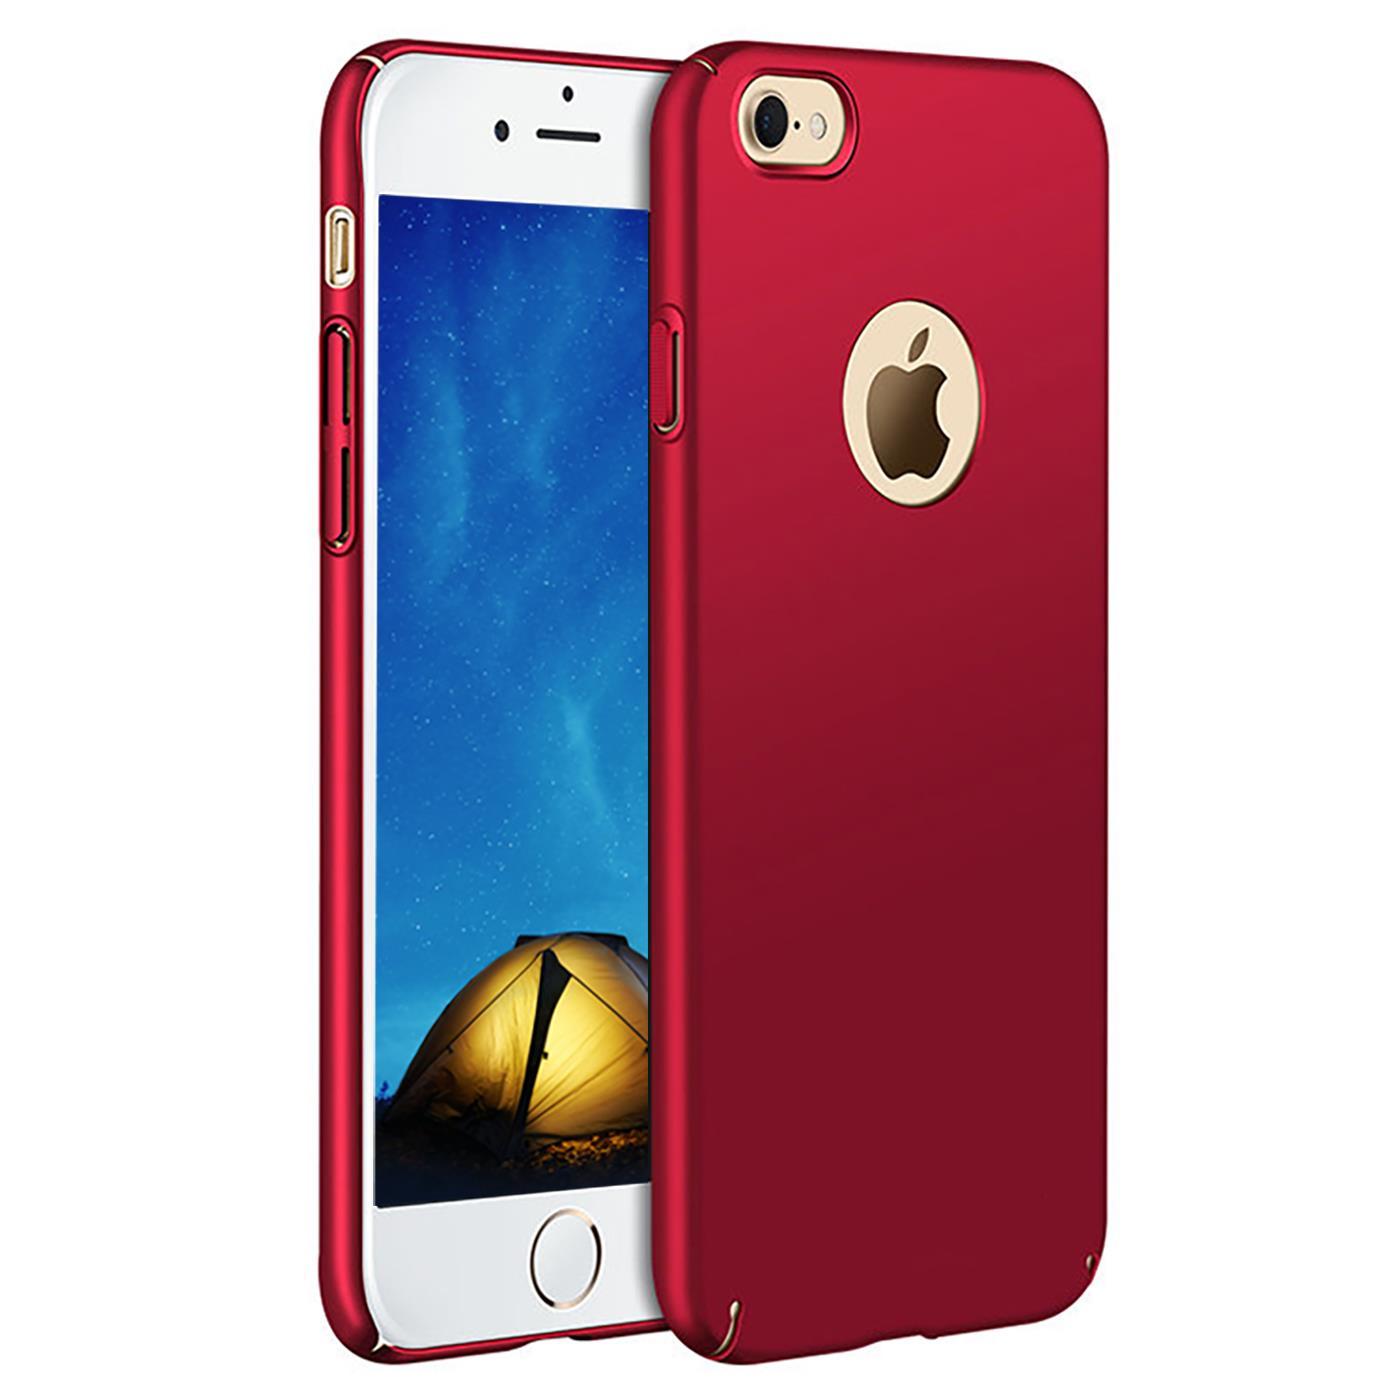 Handy Hülle Apple Apple iPhone 6 6S Case Handytasche Hardcase Bumper Cover Slim